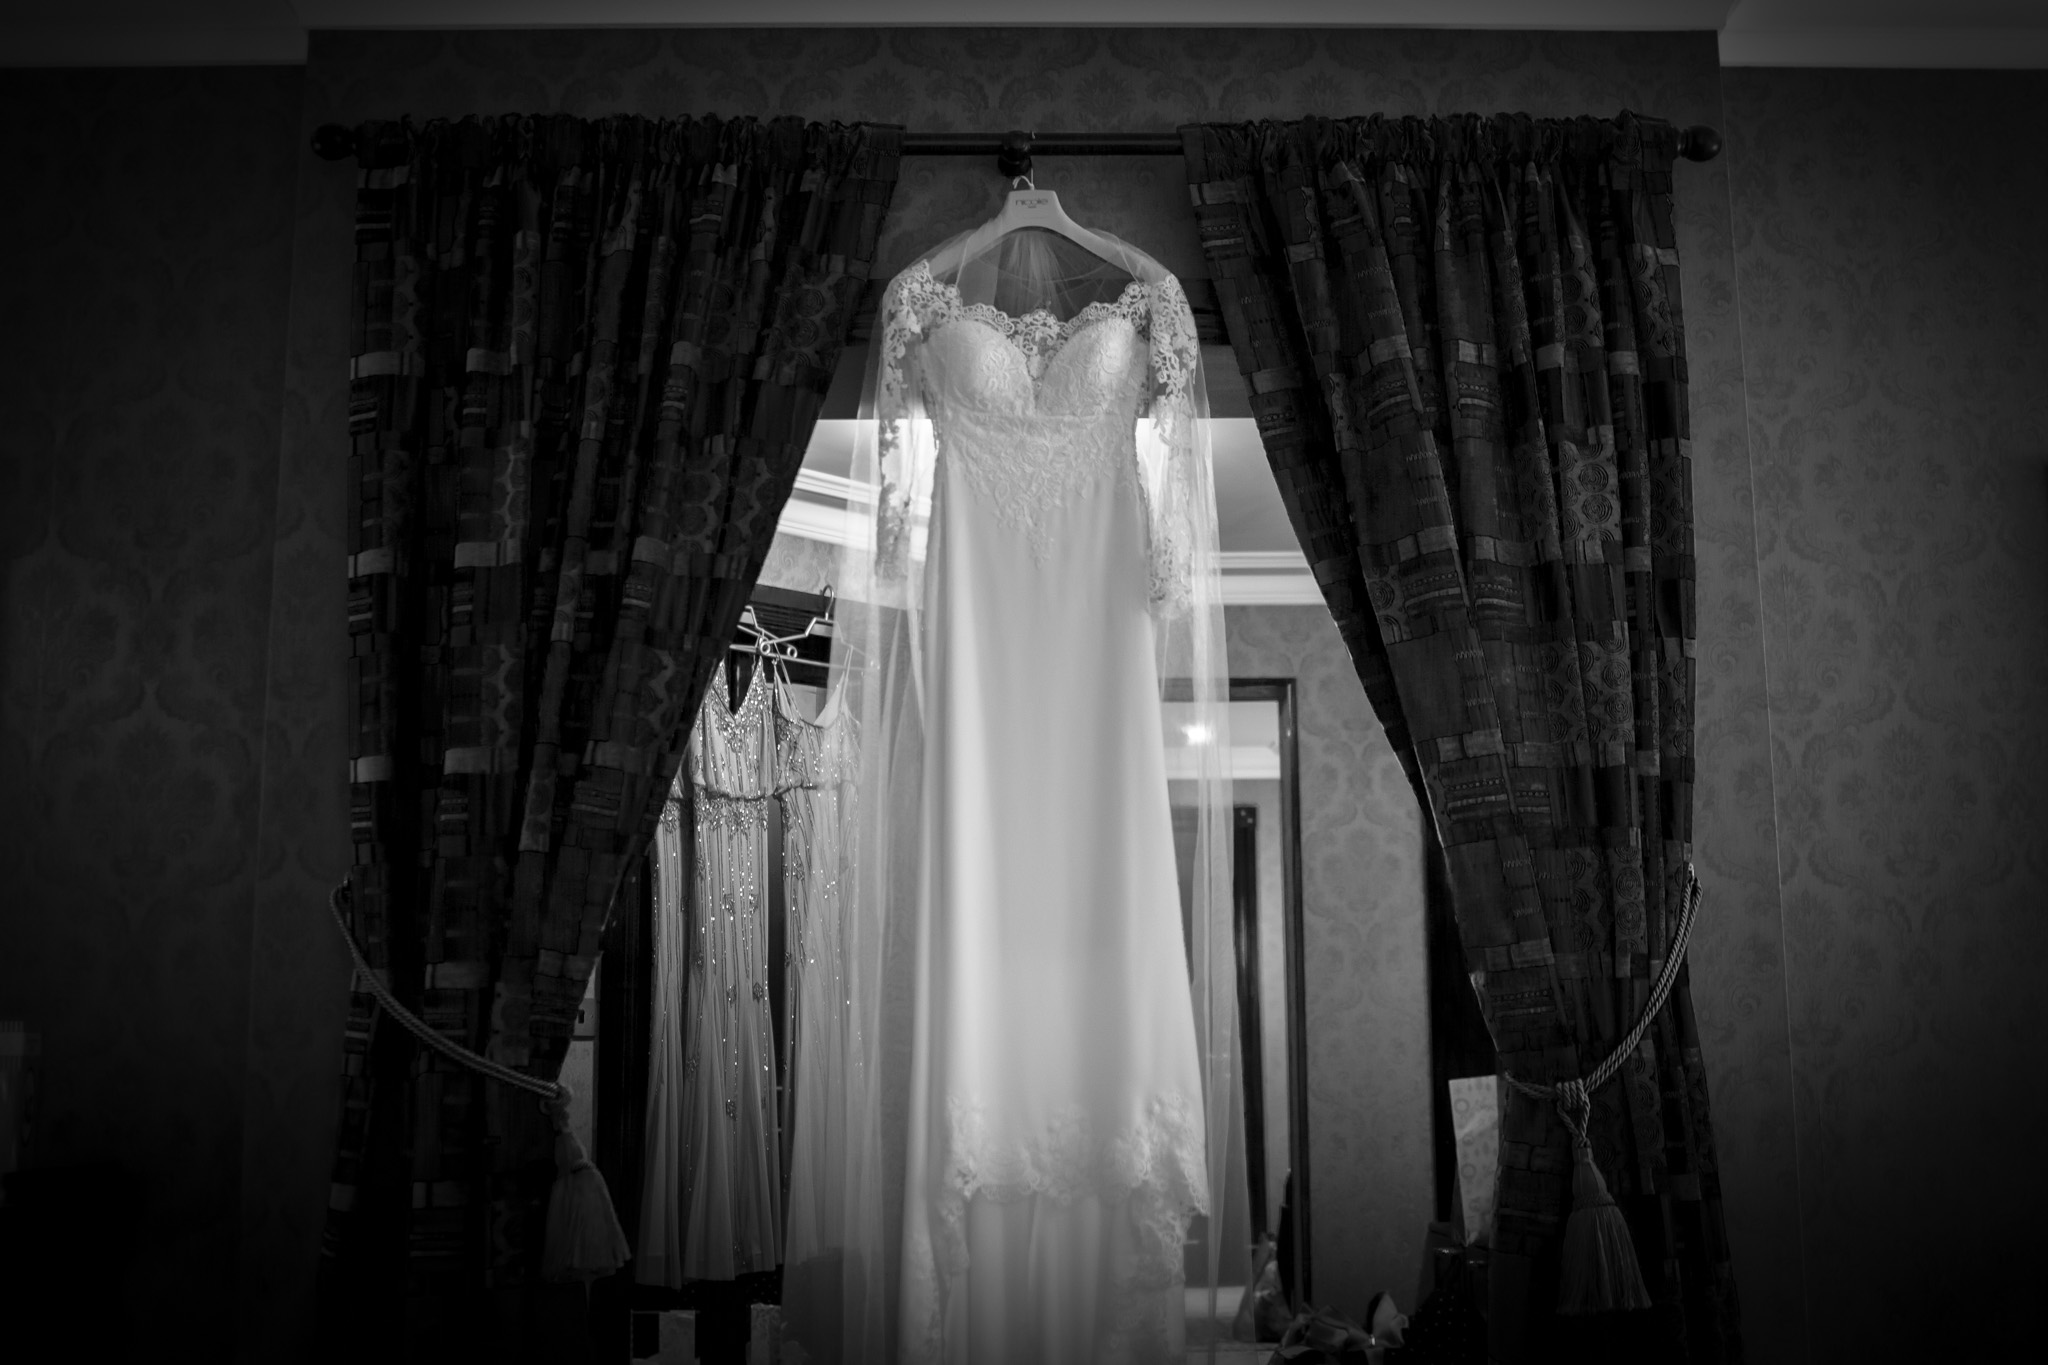 Mark_Barnes_Northern_Ireland_wedding_photographer_Harveys_Point_Donegall_Wedding_photography-Adam&Gemma-1.jpg